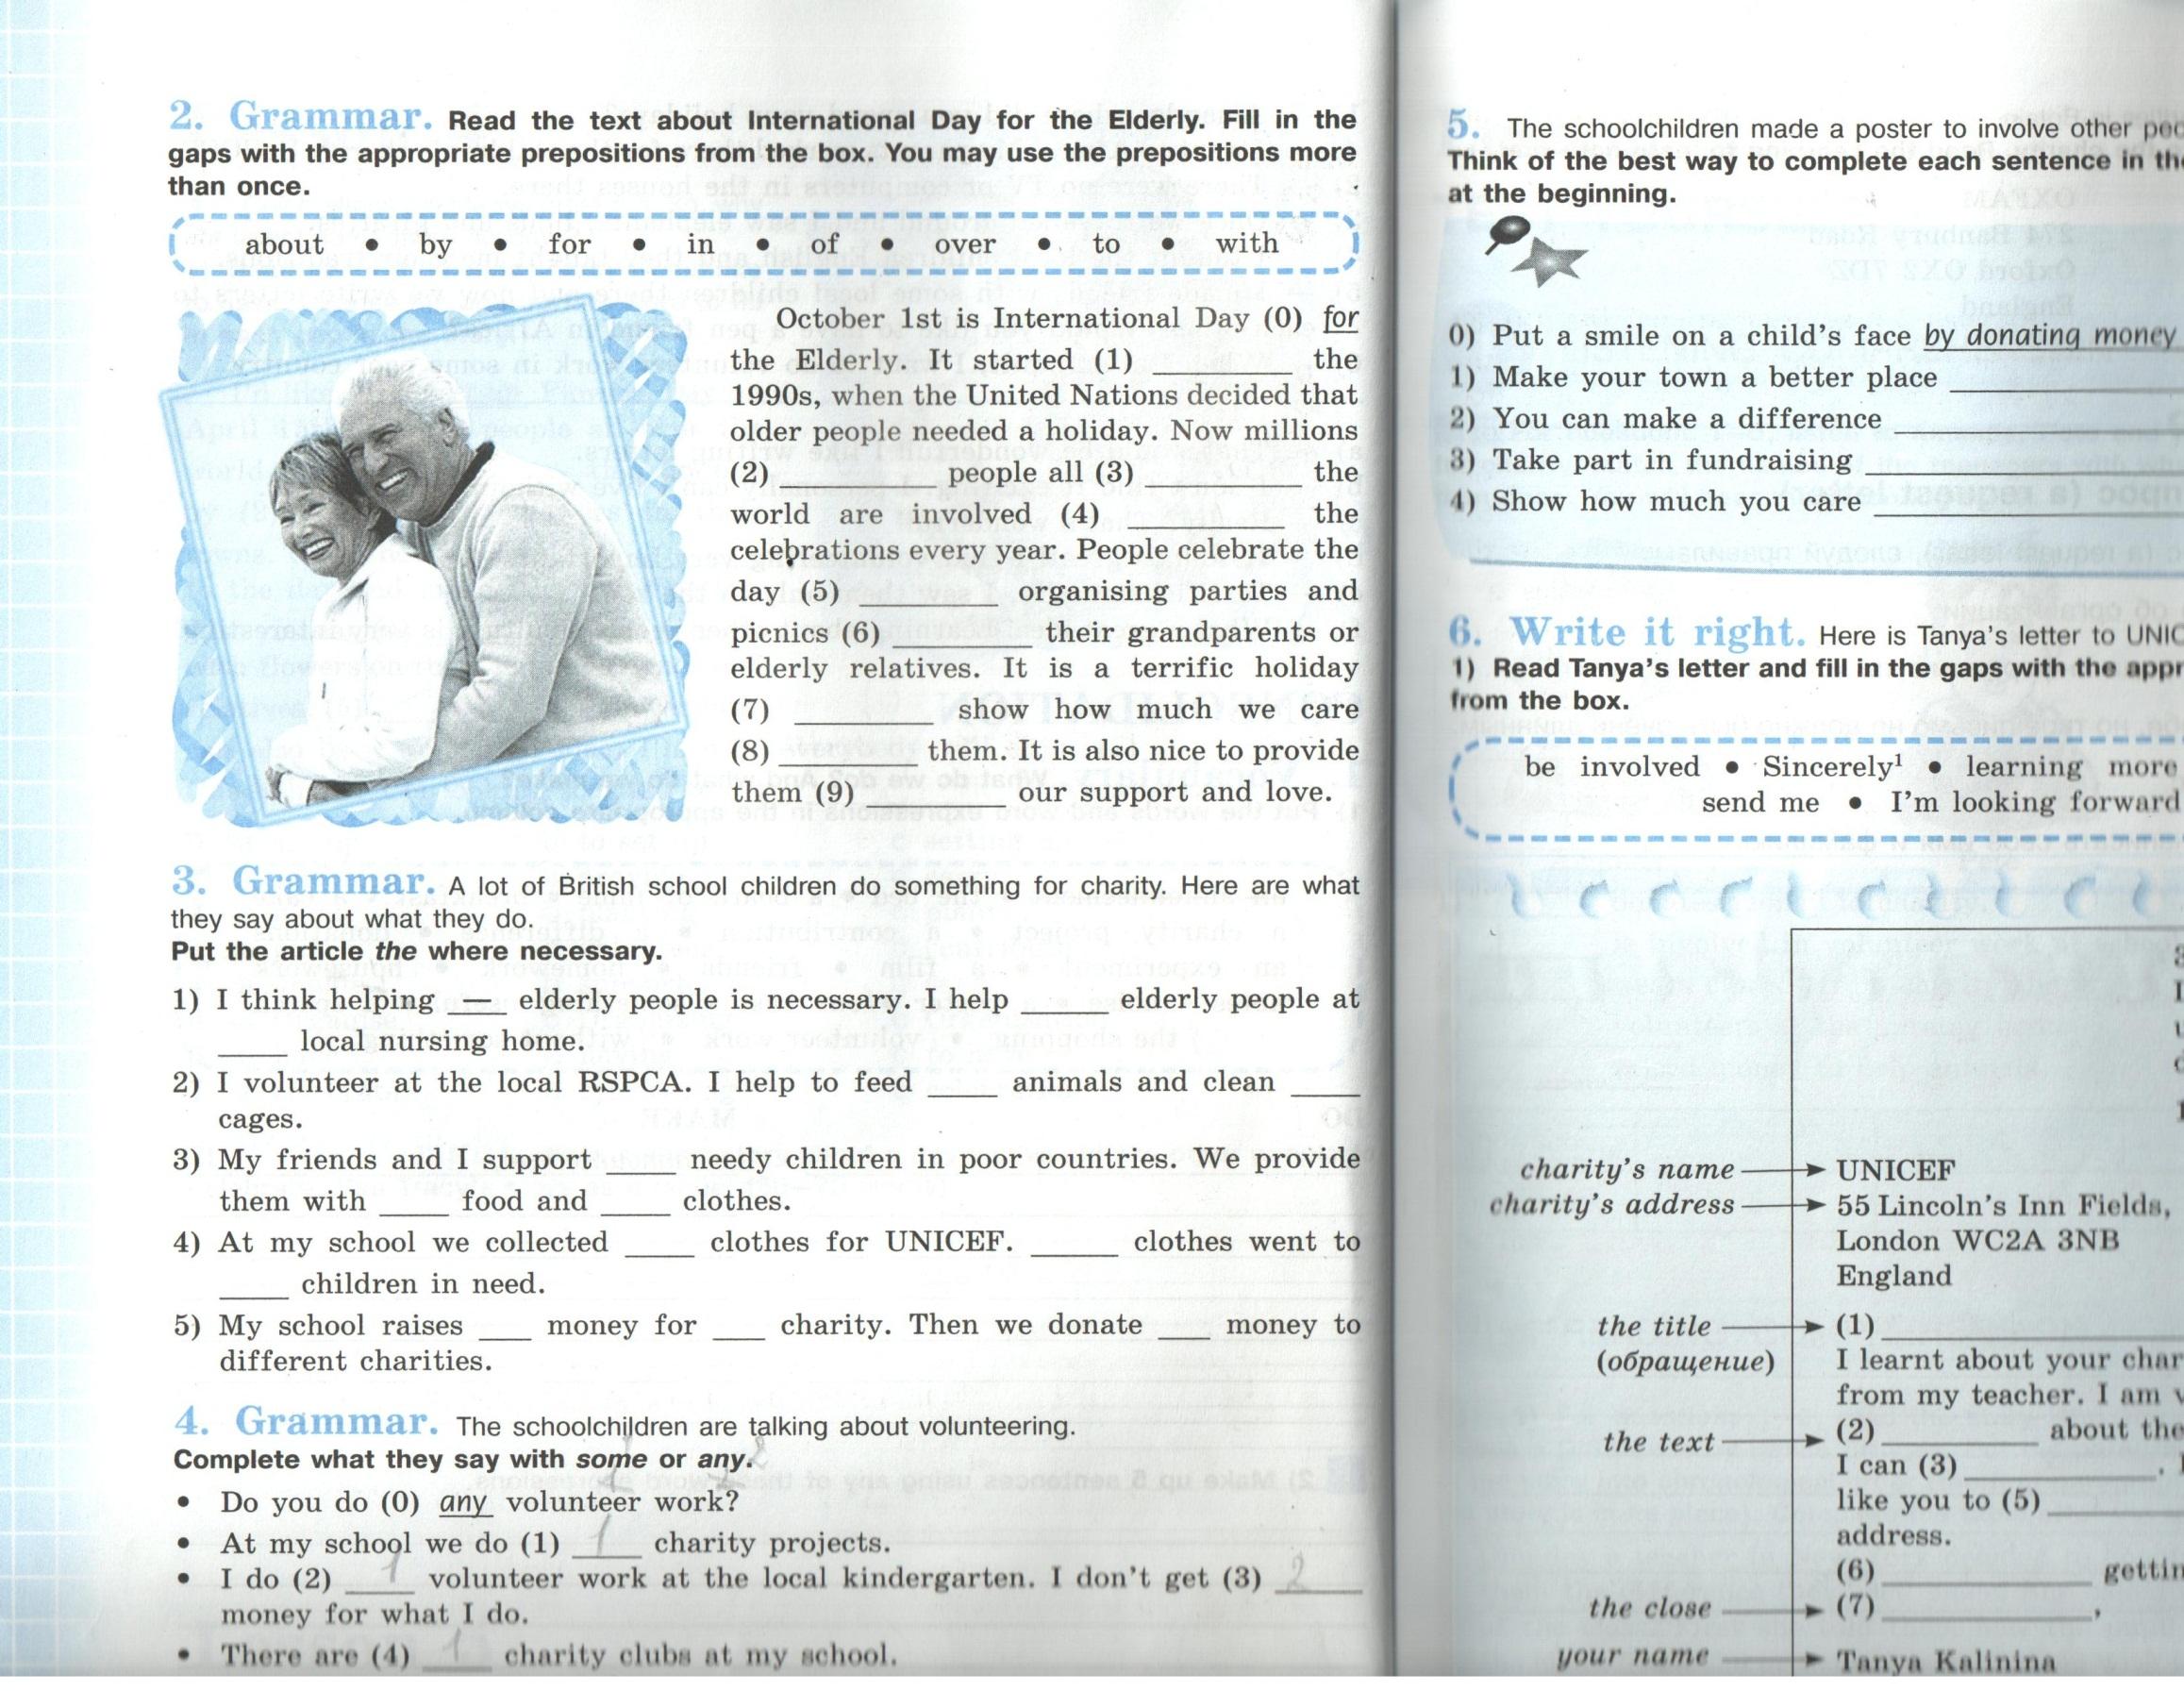 C:\Users\Грузиновская СОШ\Documents\Scanned Documents\Рисунок (1954).jpg